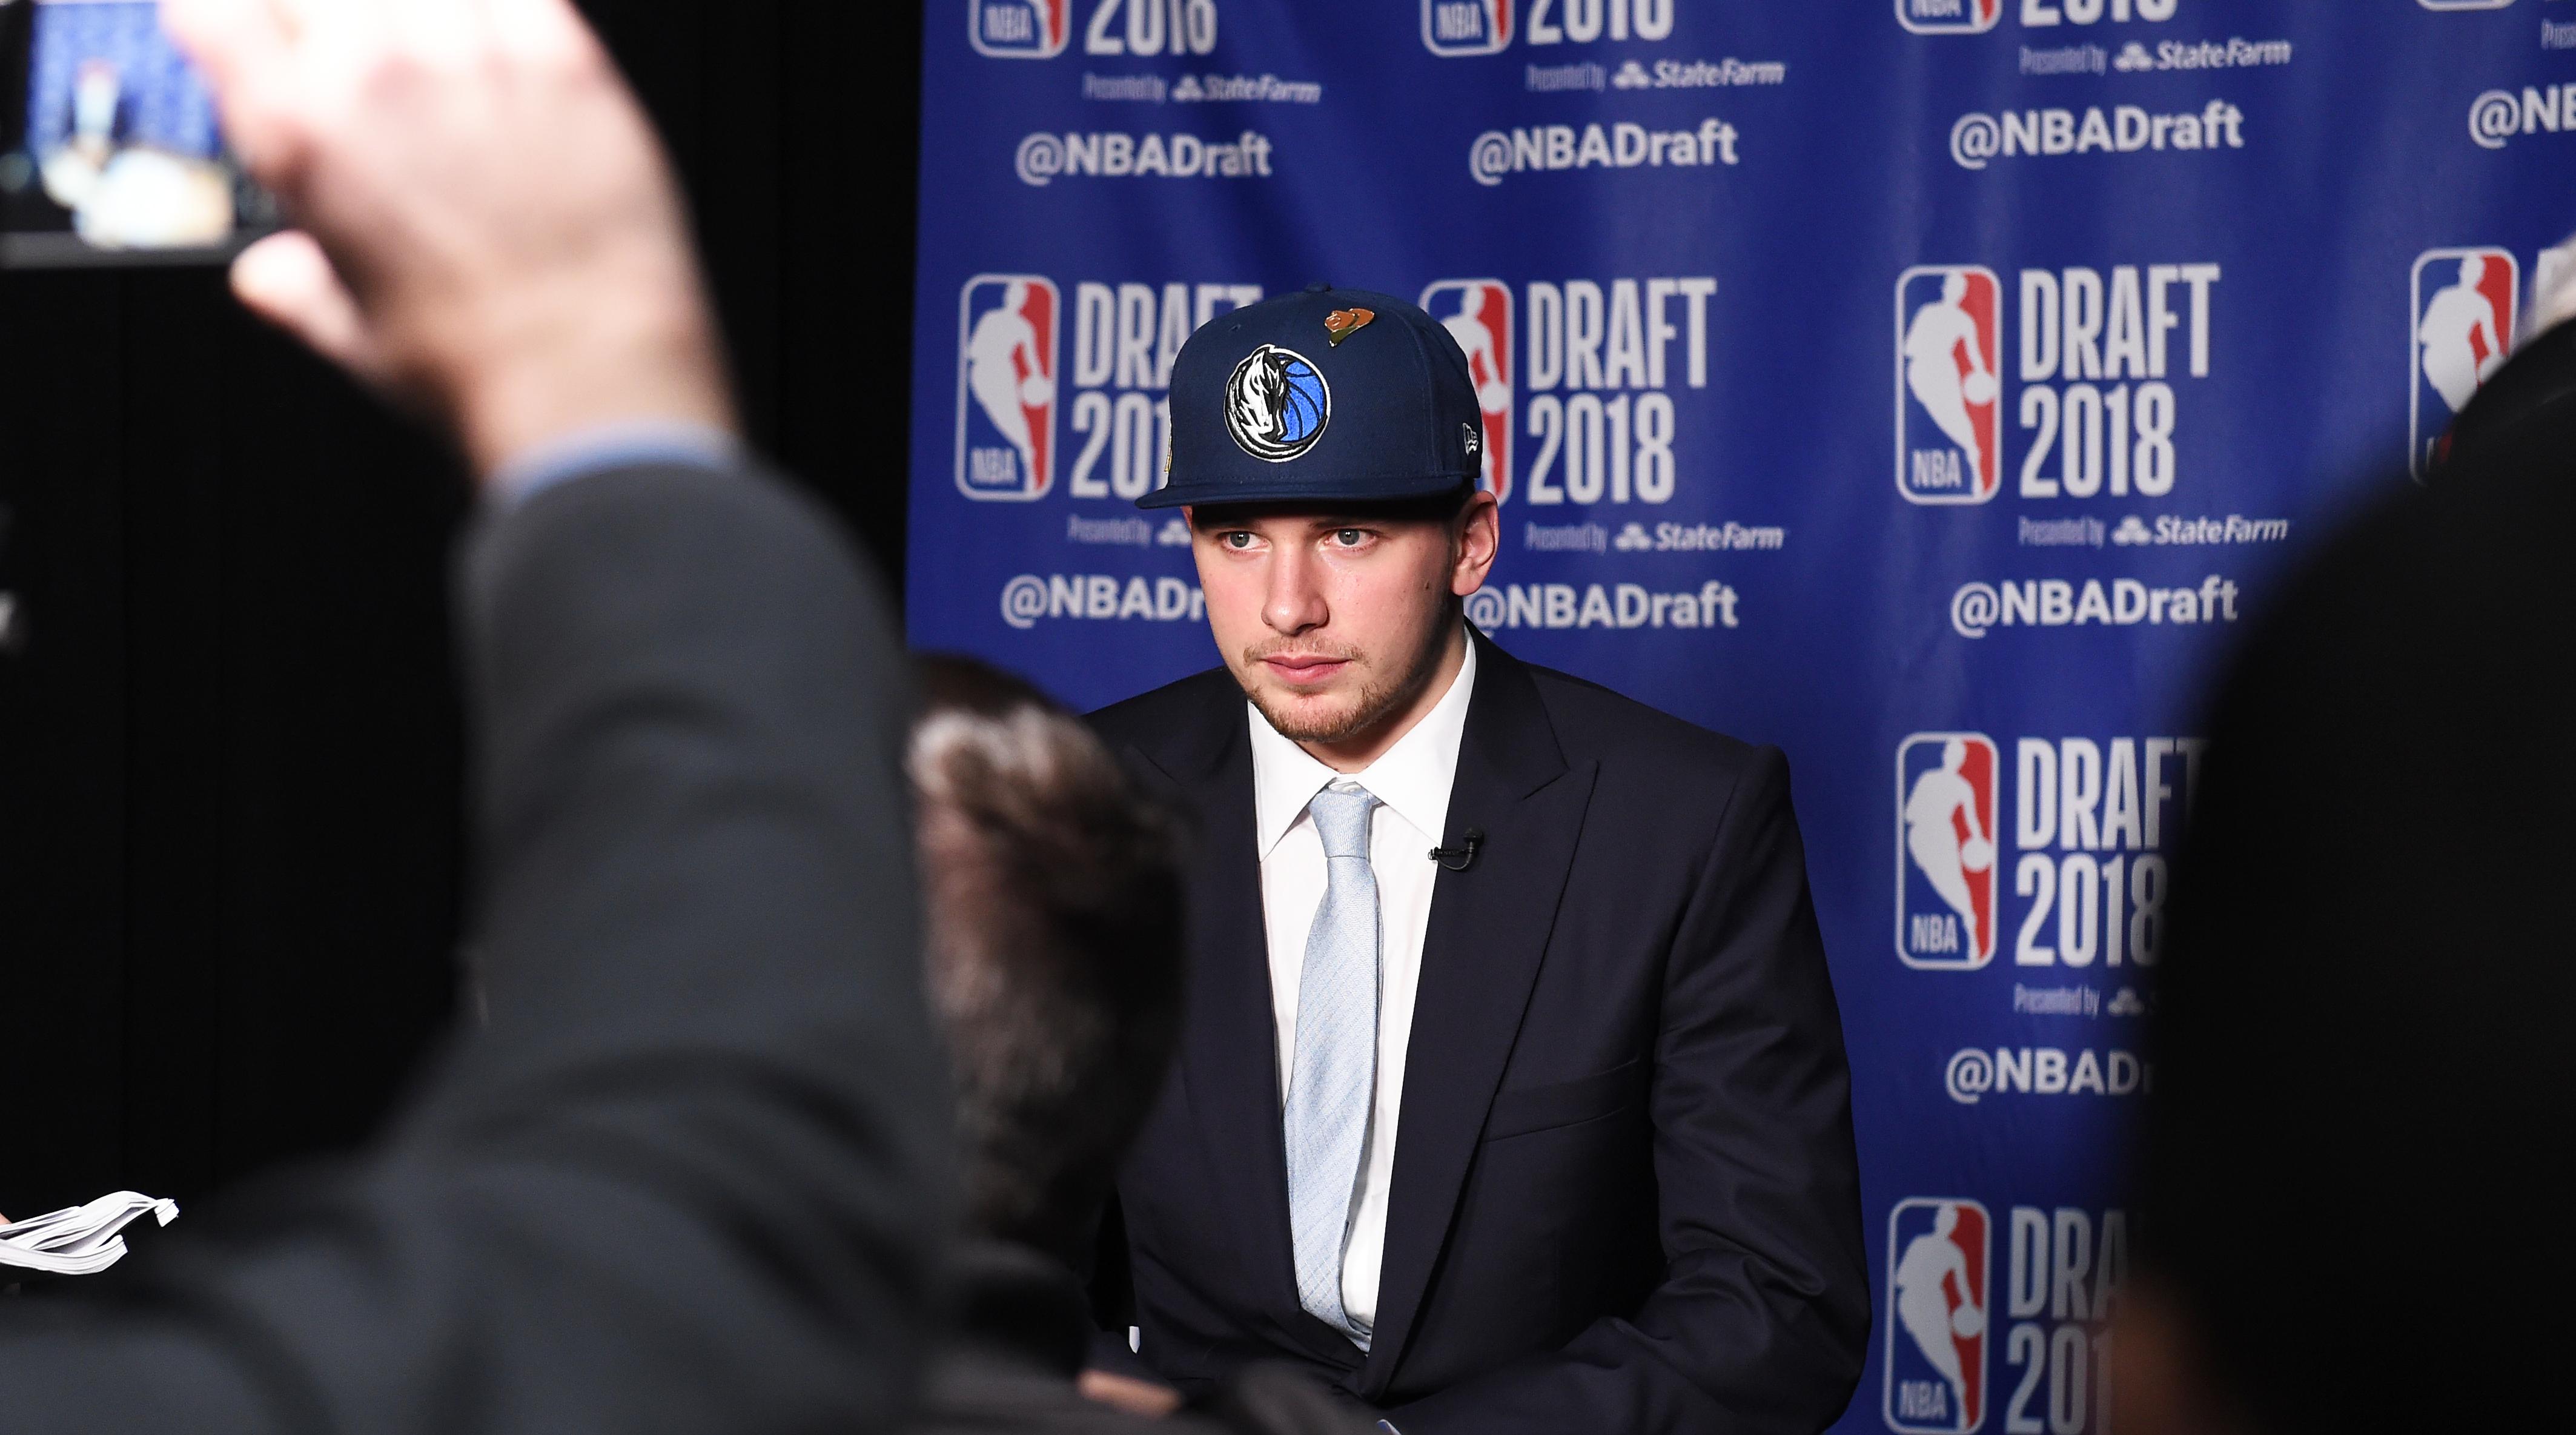 2018 NBA Draft